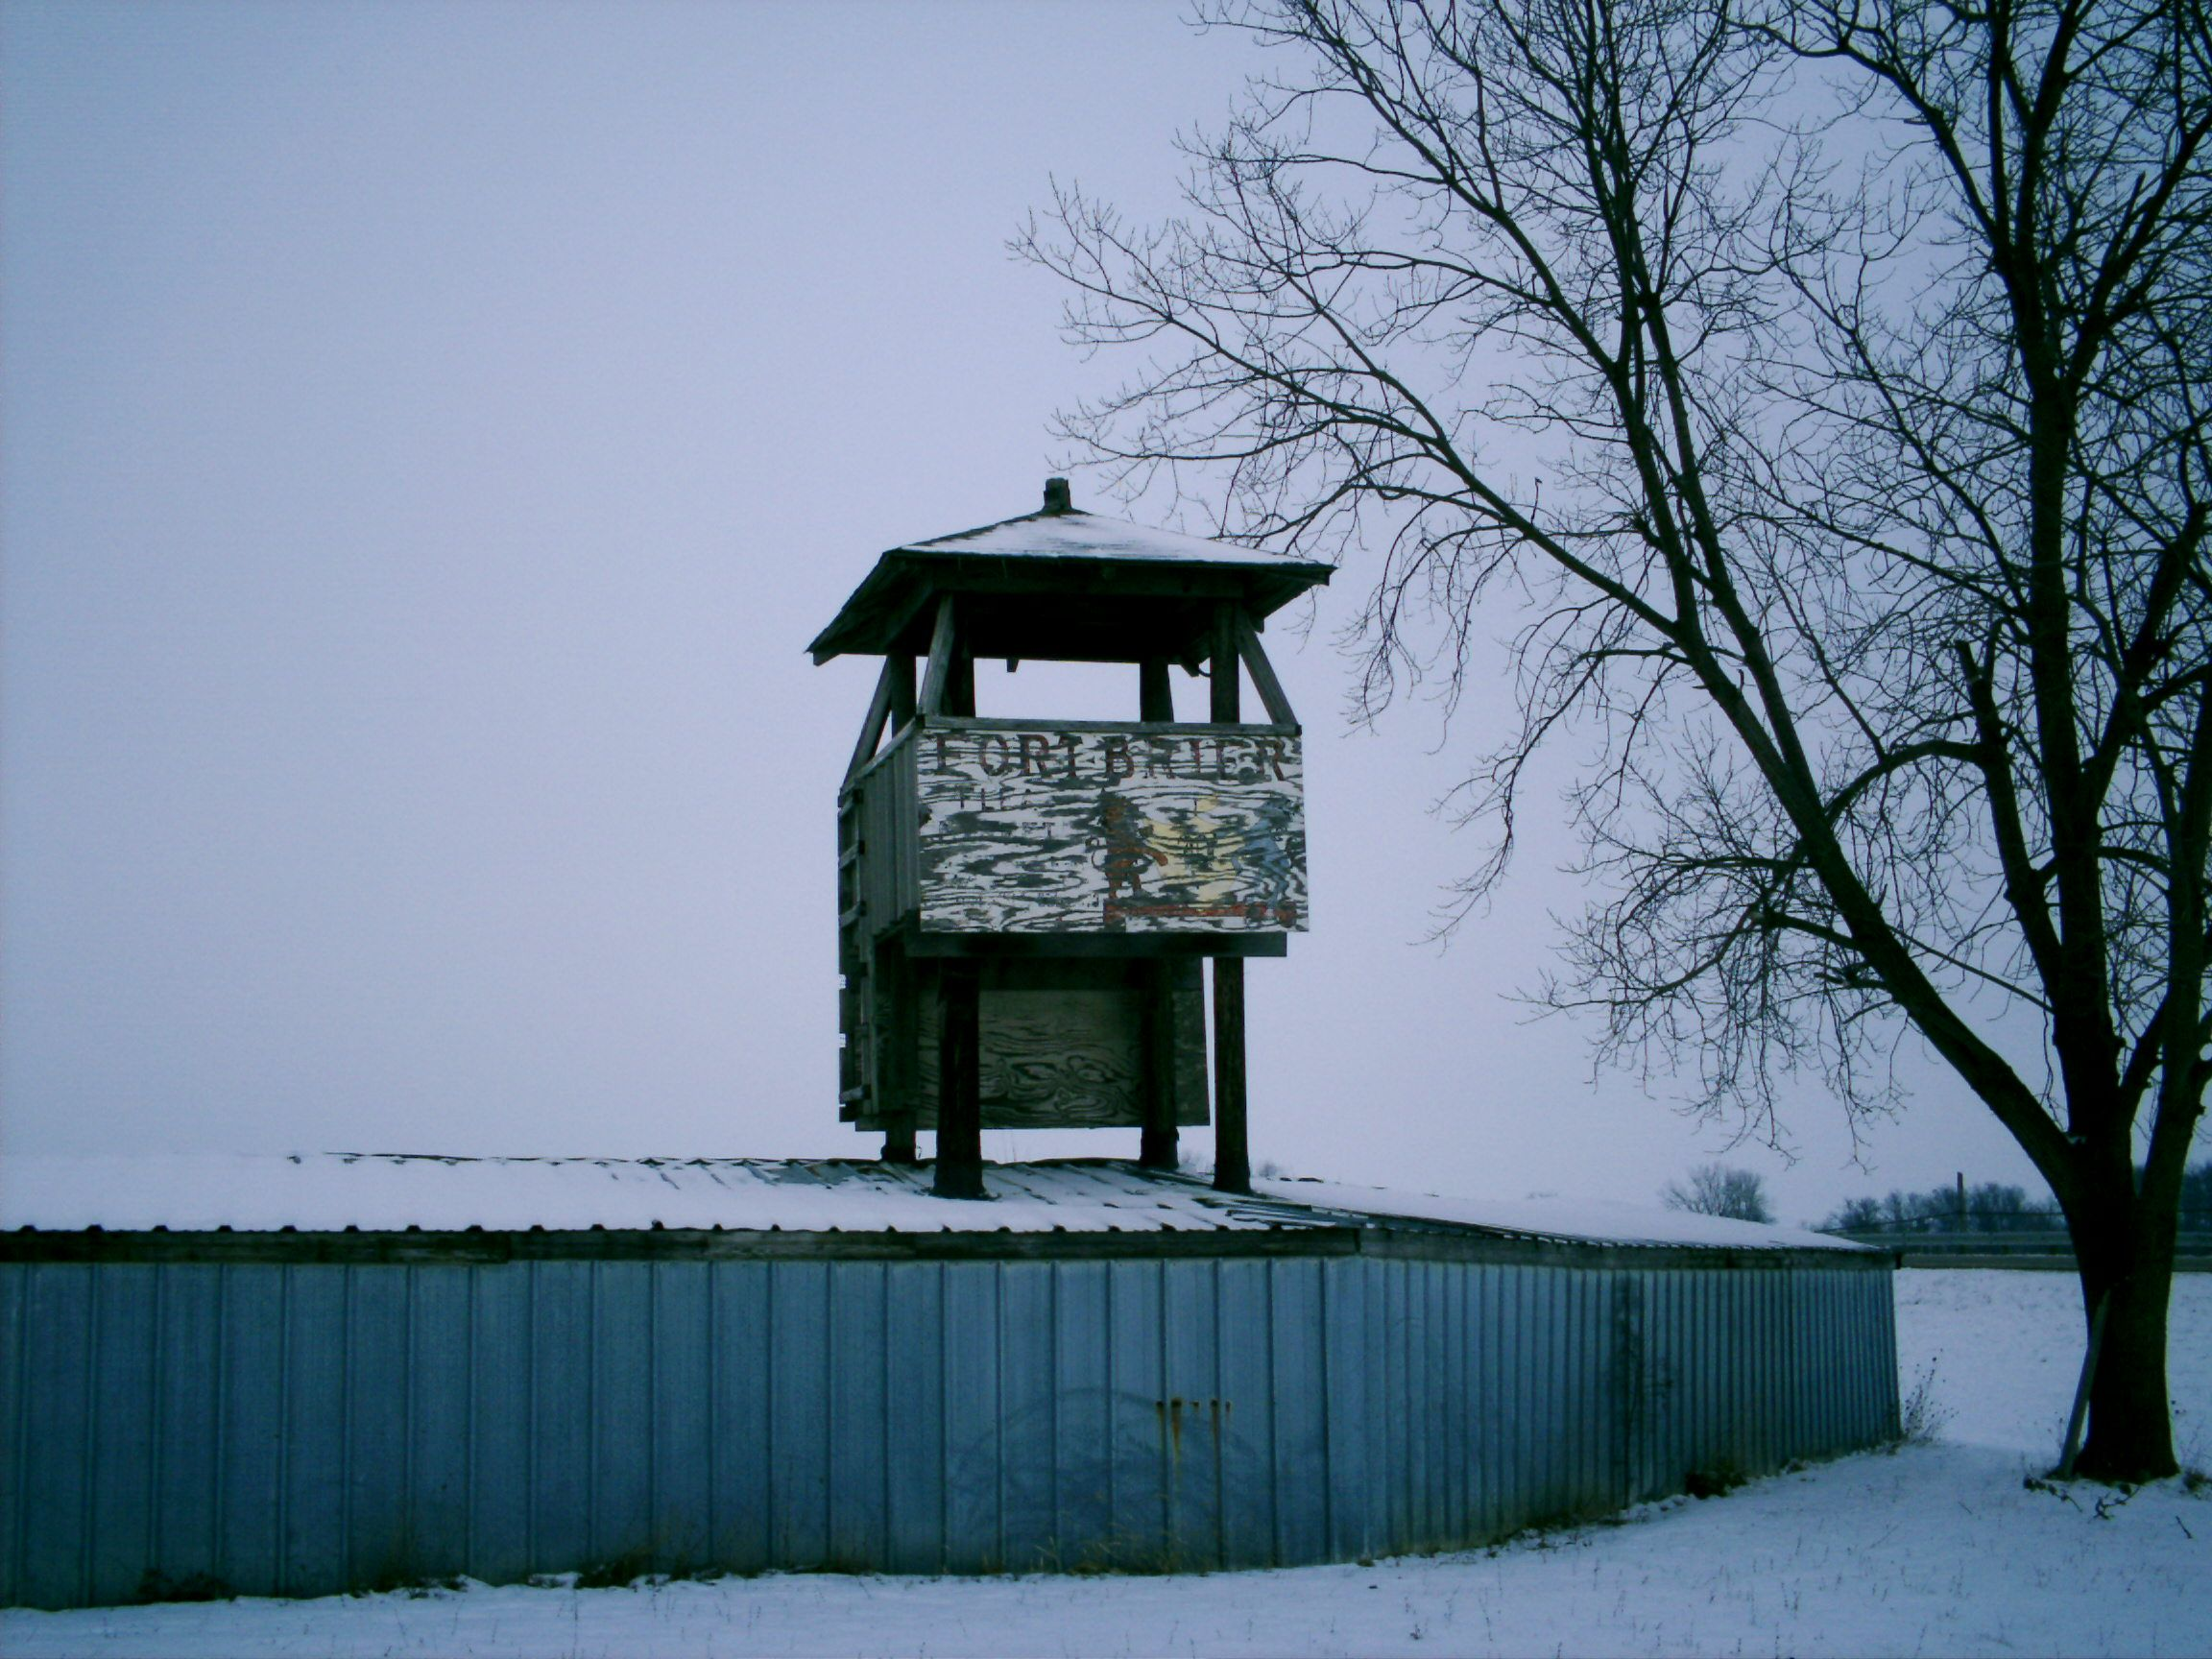 Ohio darke county north star - Dawn Oh Darke County One Of The Guard Towers Haha